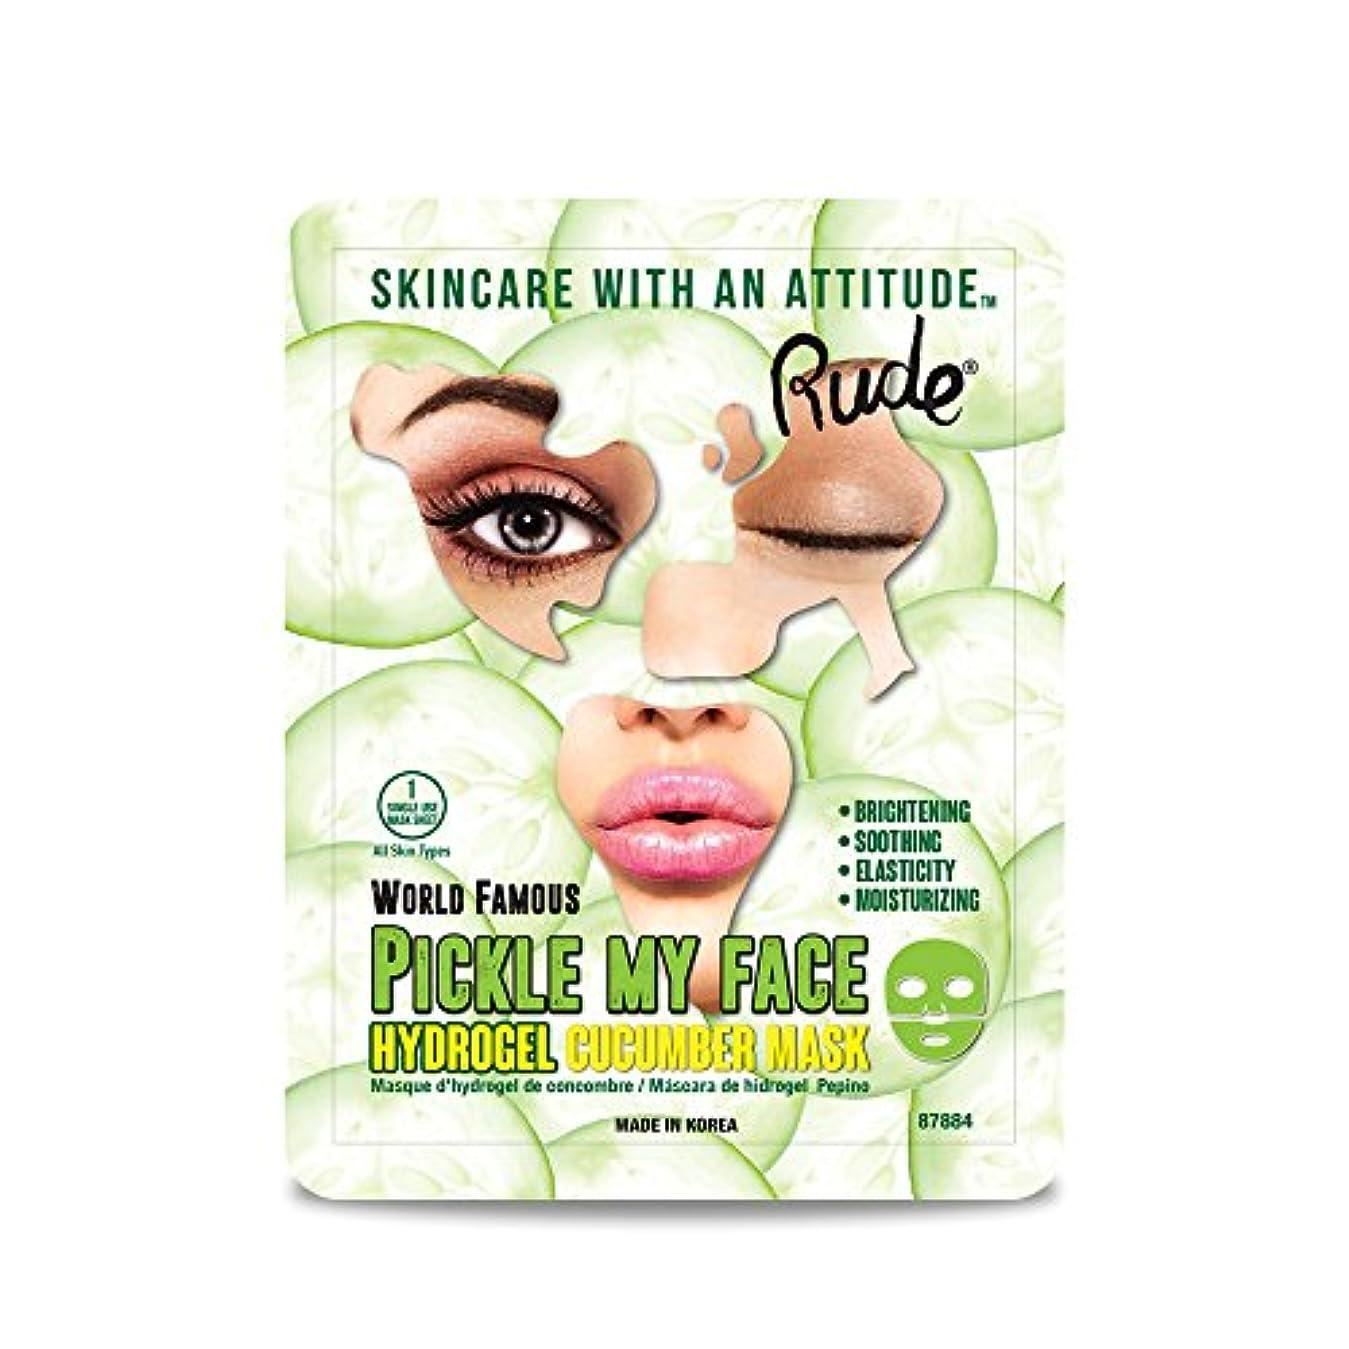 (3 Pack) RUDE Pickle My Face Hydrogel Cucumber Mask (並行輸入品)